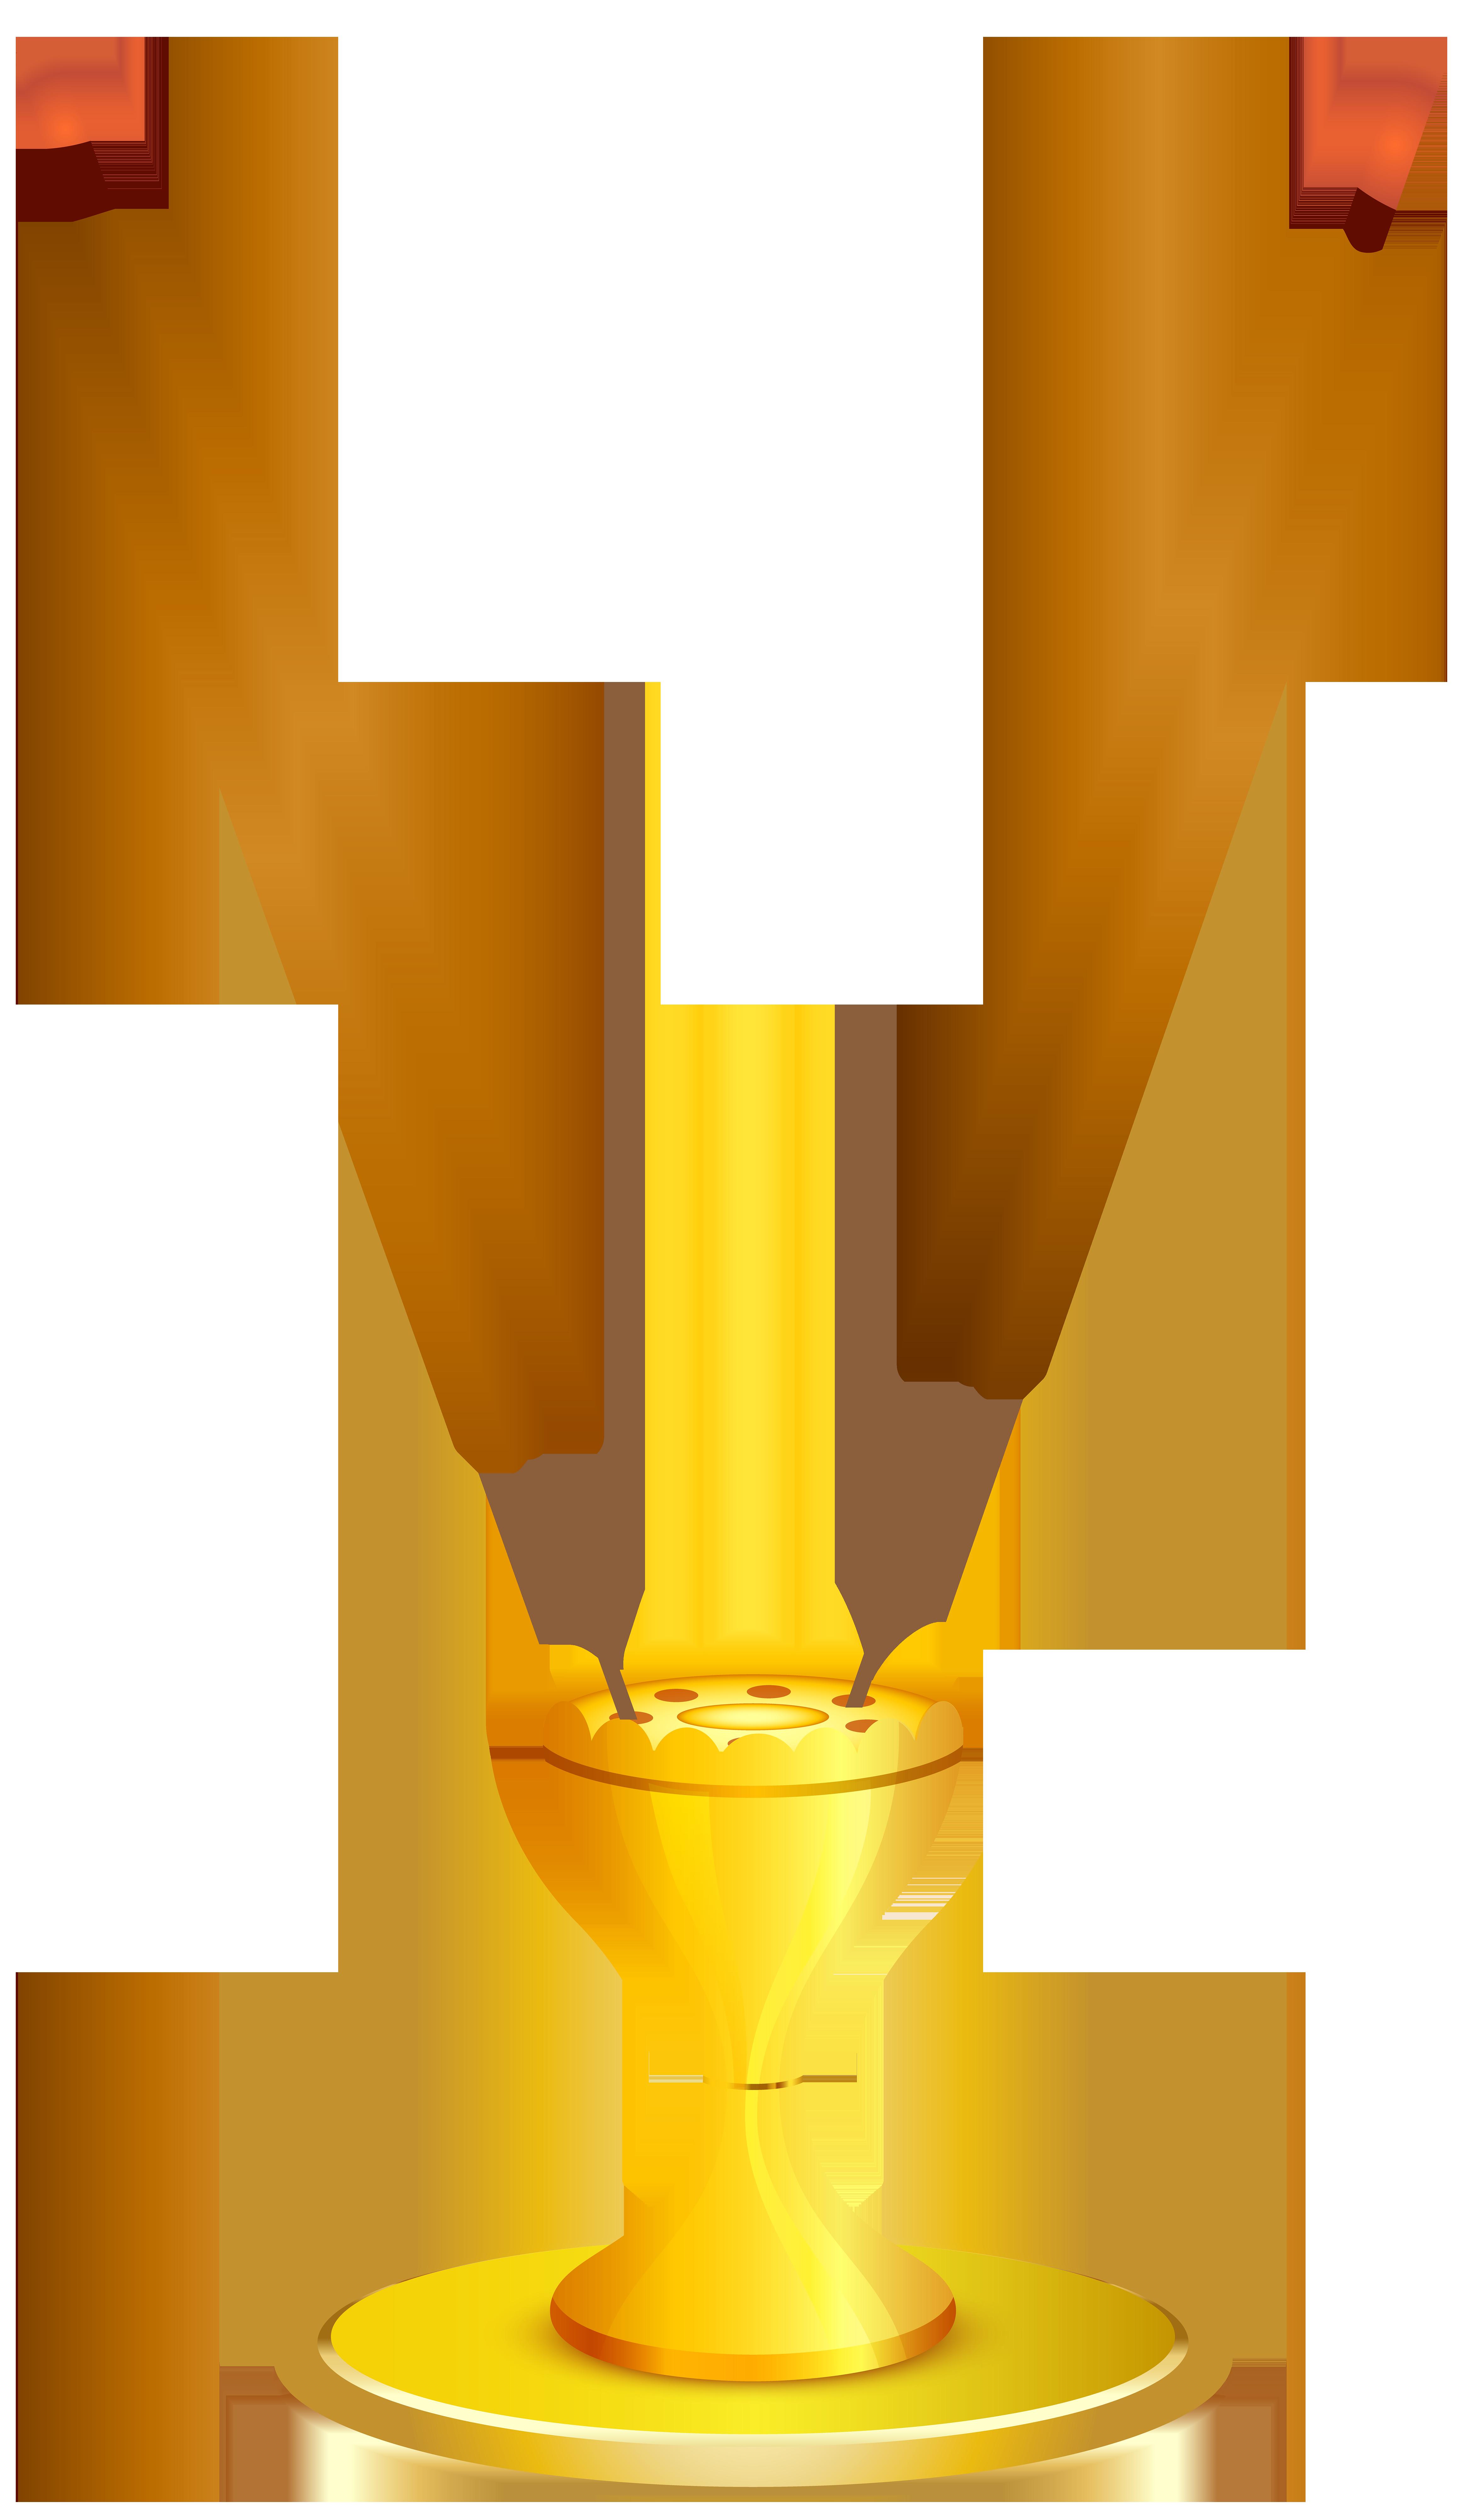 Indian Incense Sticks Transparent Clip Art Image.